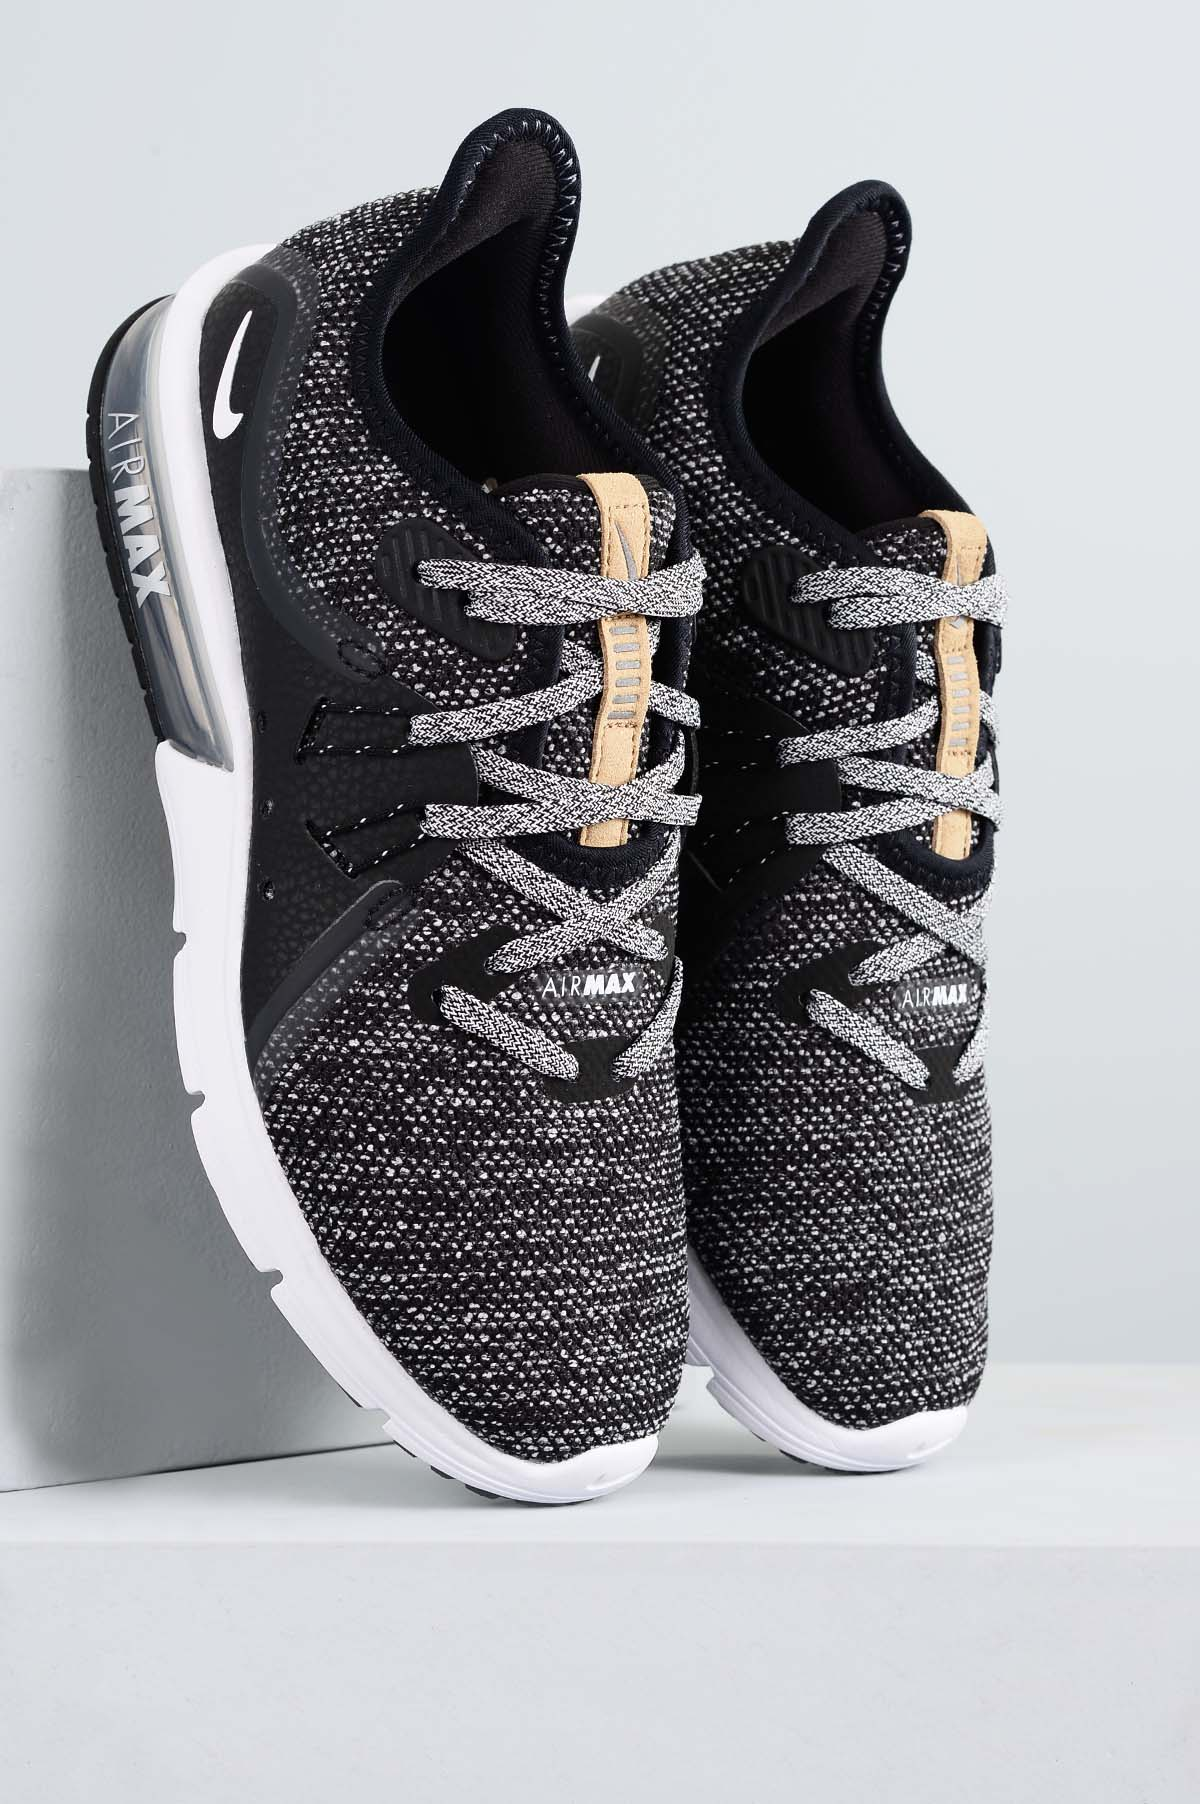 huge selection of d8c6b d8365 Tênis Feminino Nike Air Max Sequent 3 TEC - PRETO - Mundial Calçados